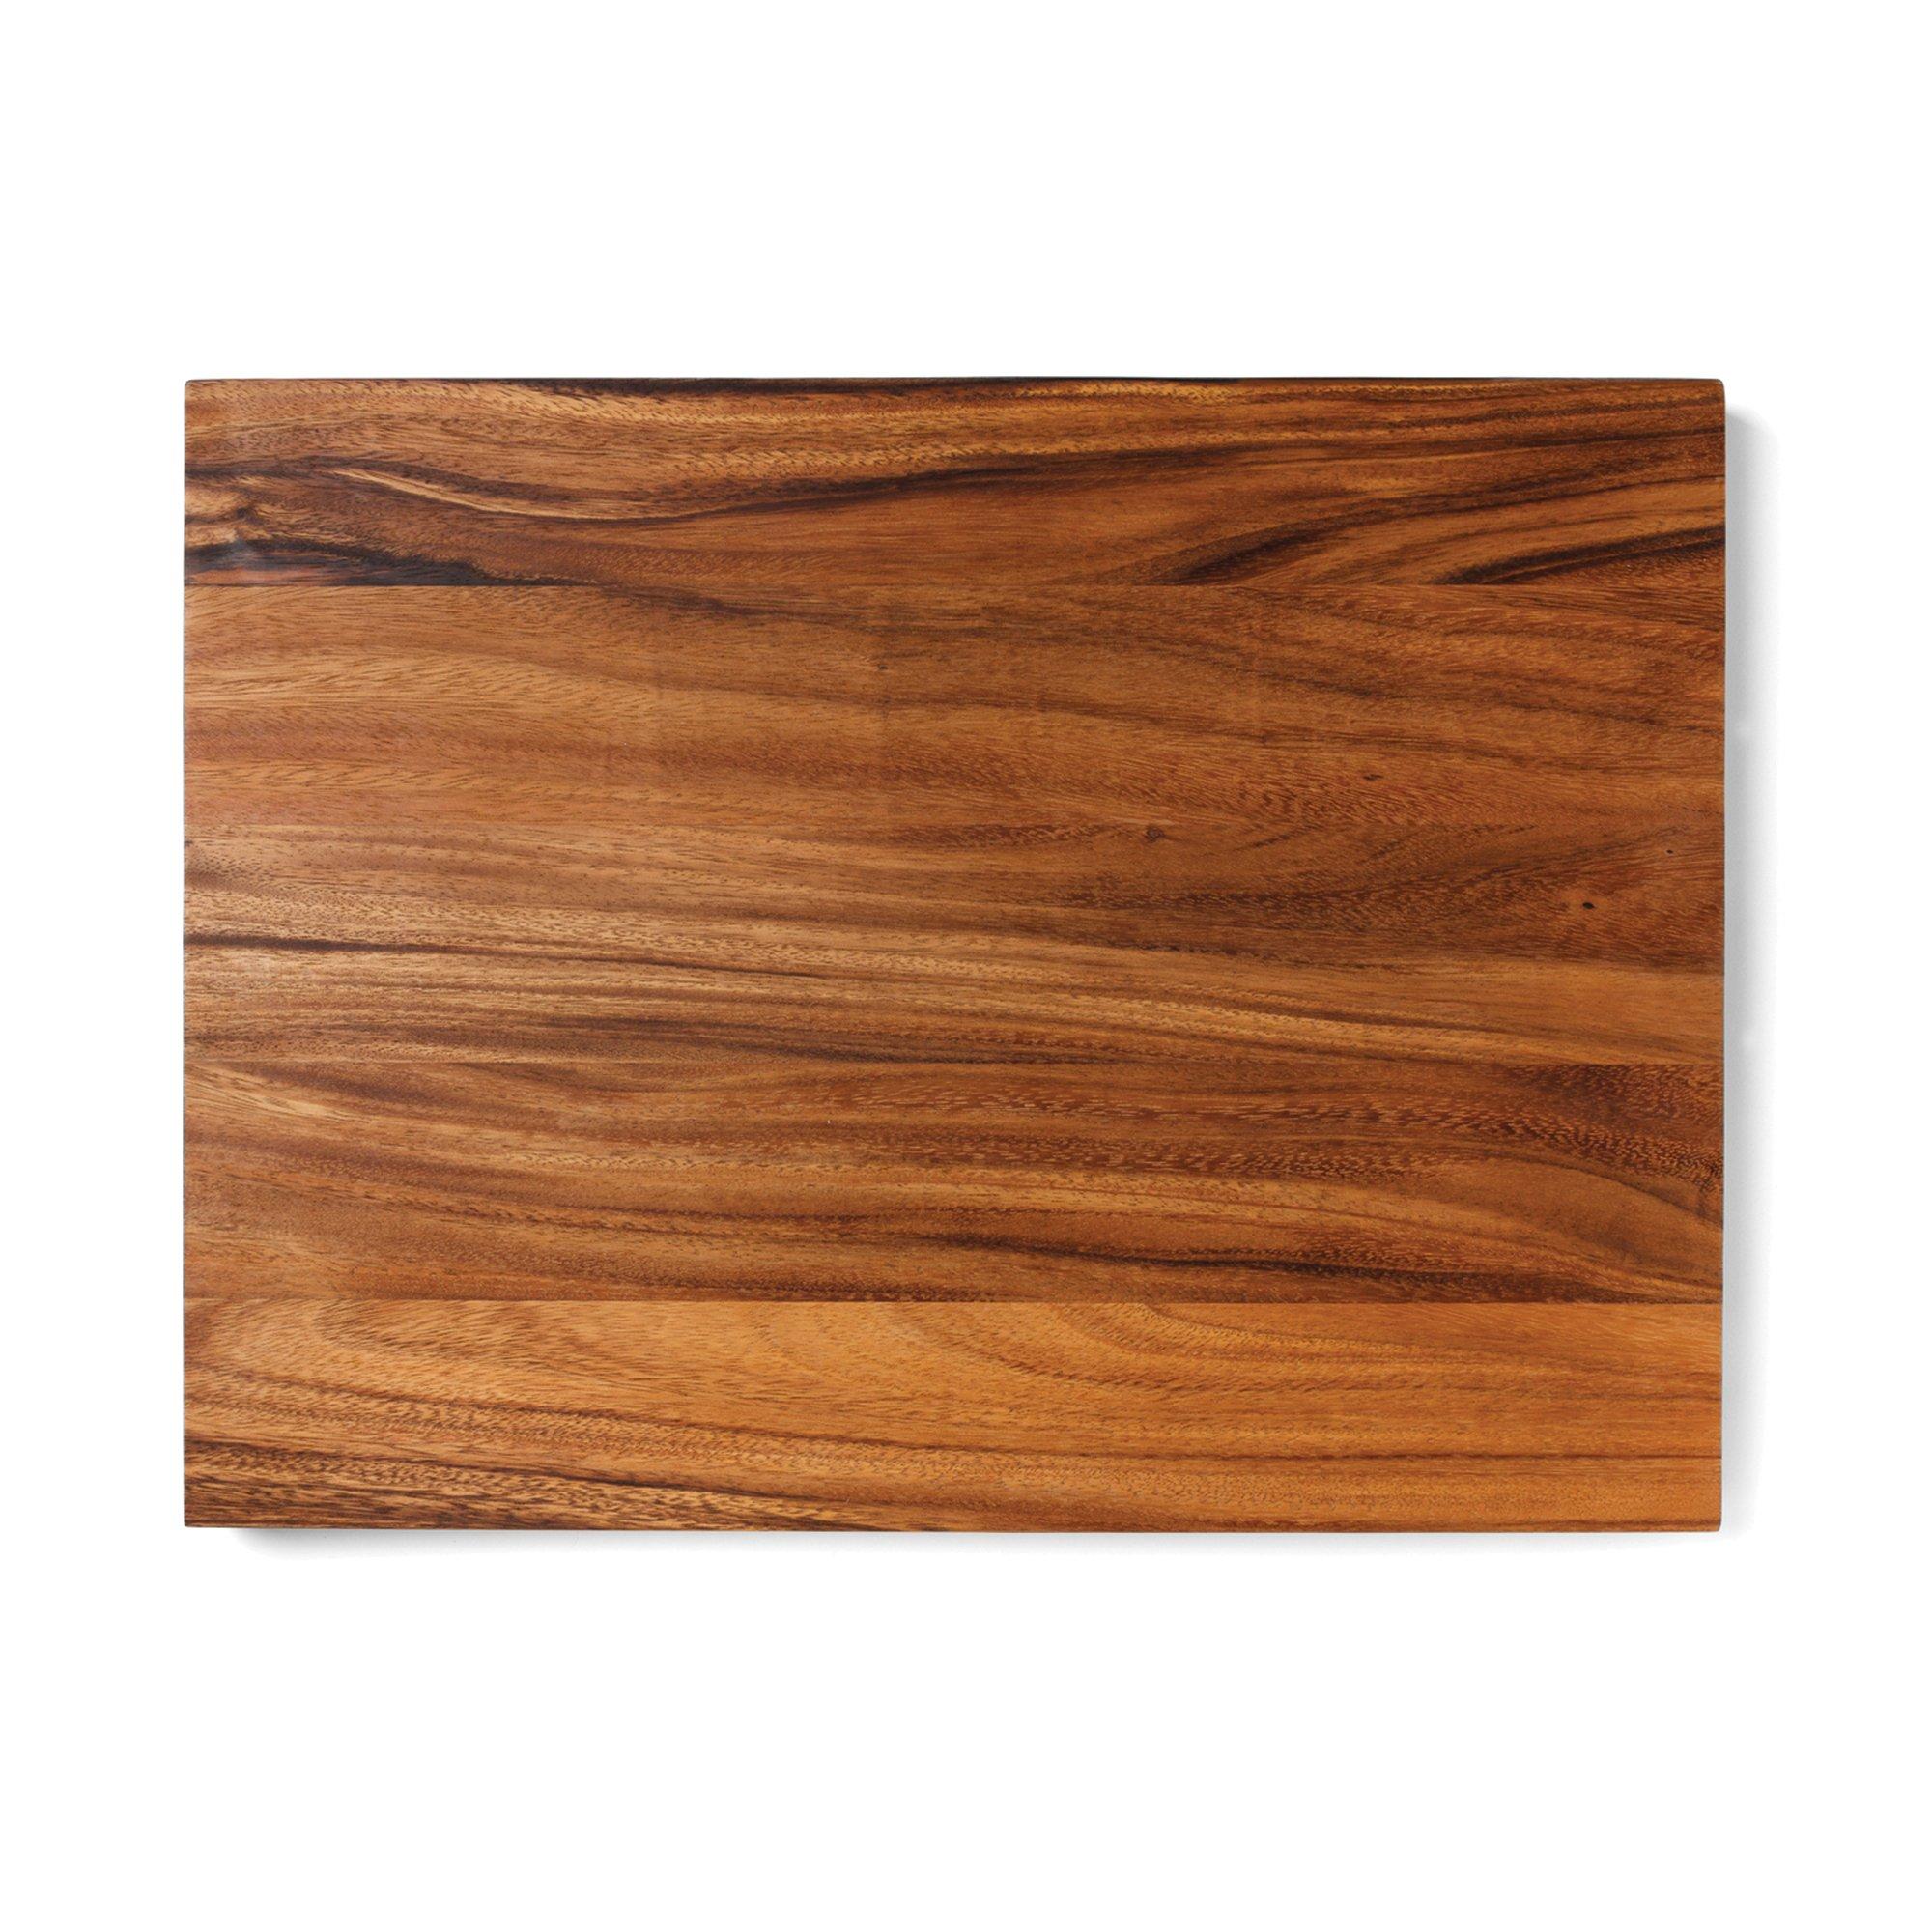 Ironwood Gourmet 28692 Long Grain Chop Board, Acacia Wood, Large by Ironwood Gourmet (Image #2)